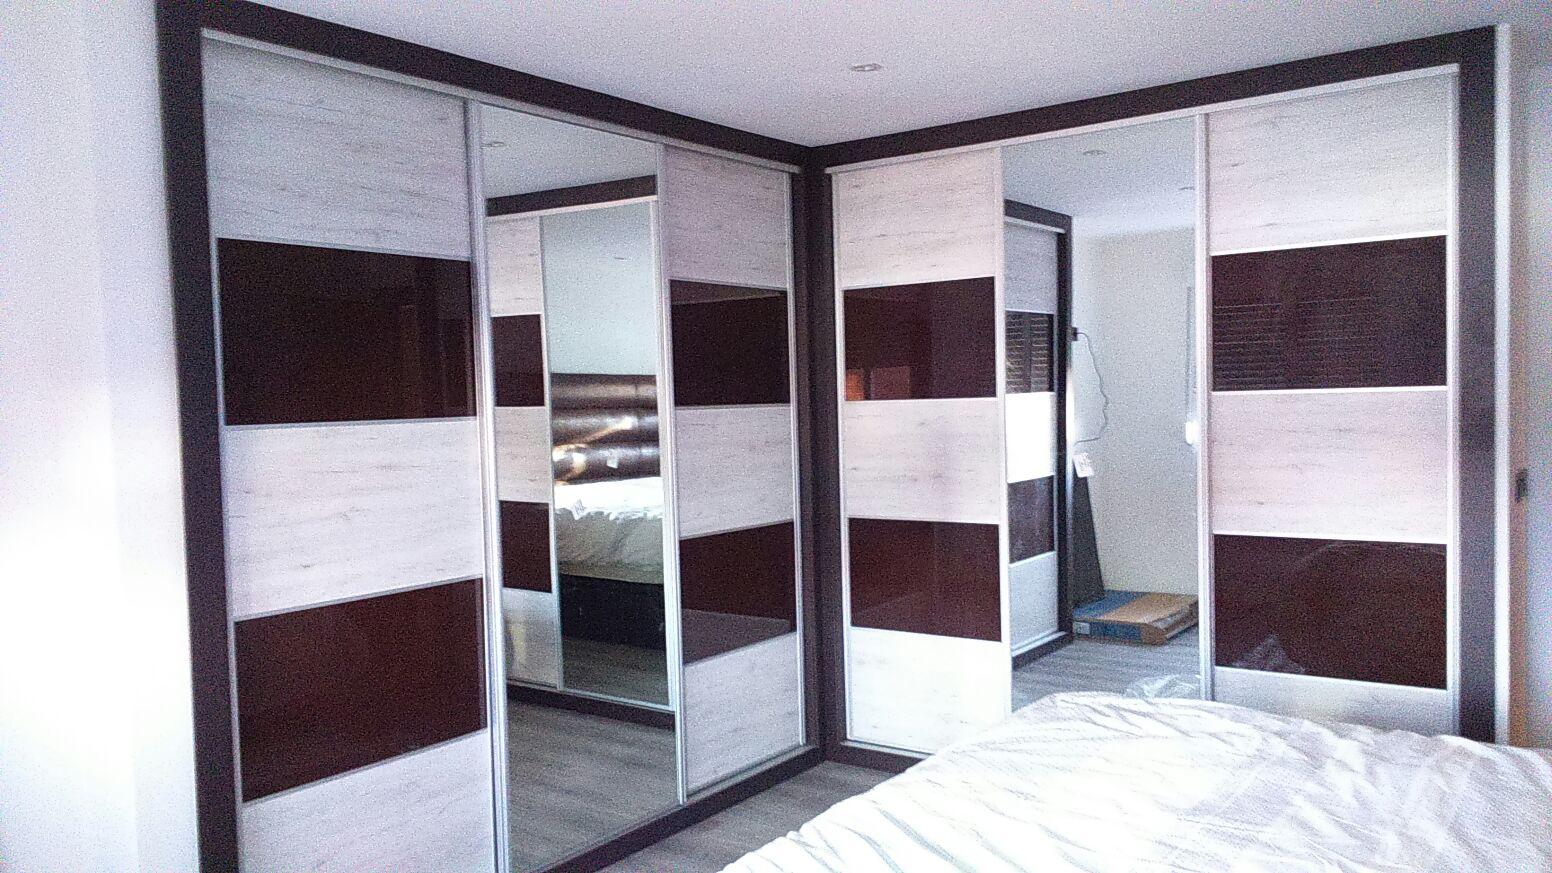 armario-morado-blanco-roto